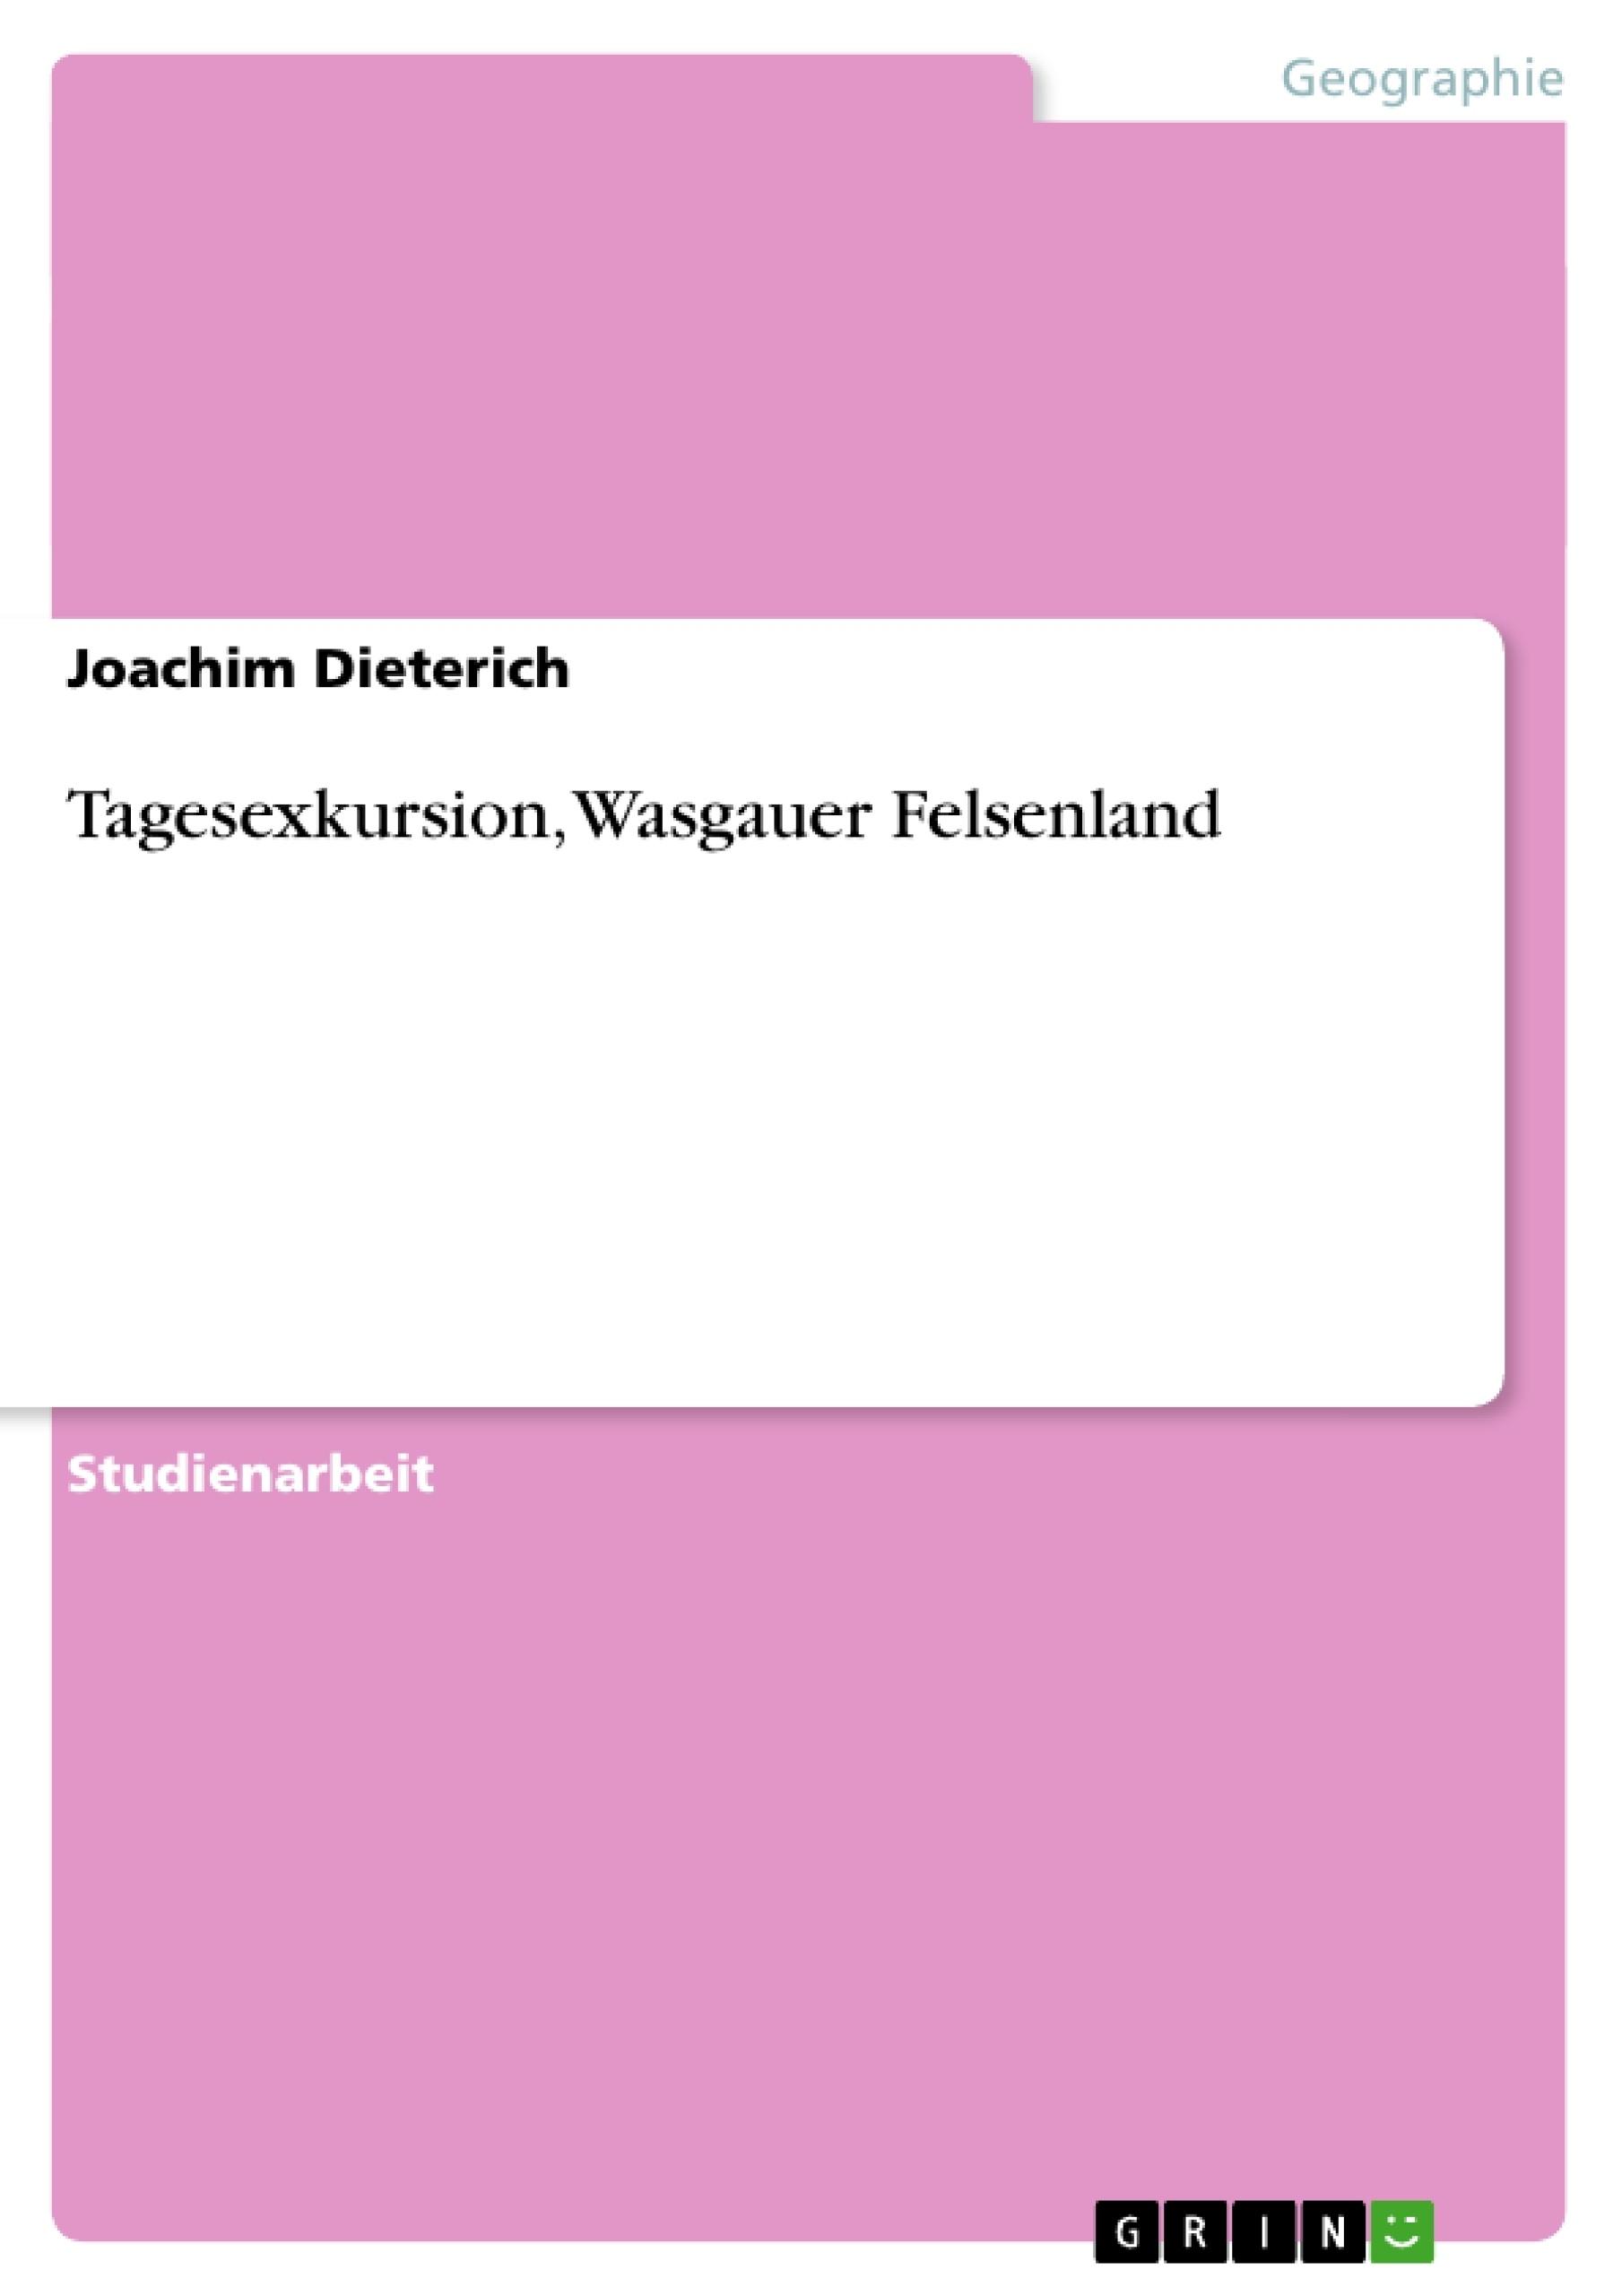 Titel: Tagesexkursion, Wasgauer Felsenland